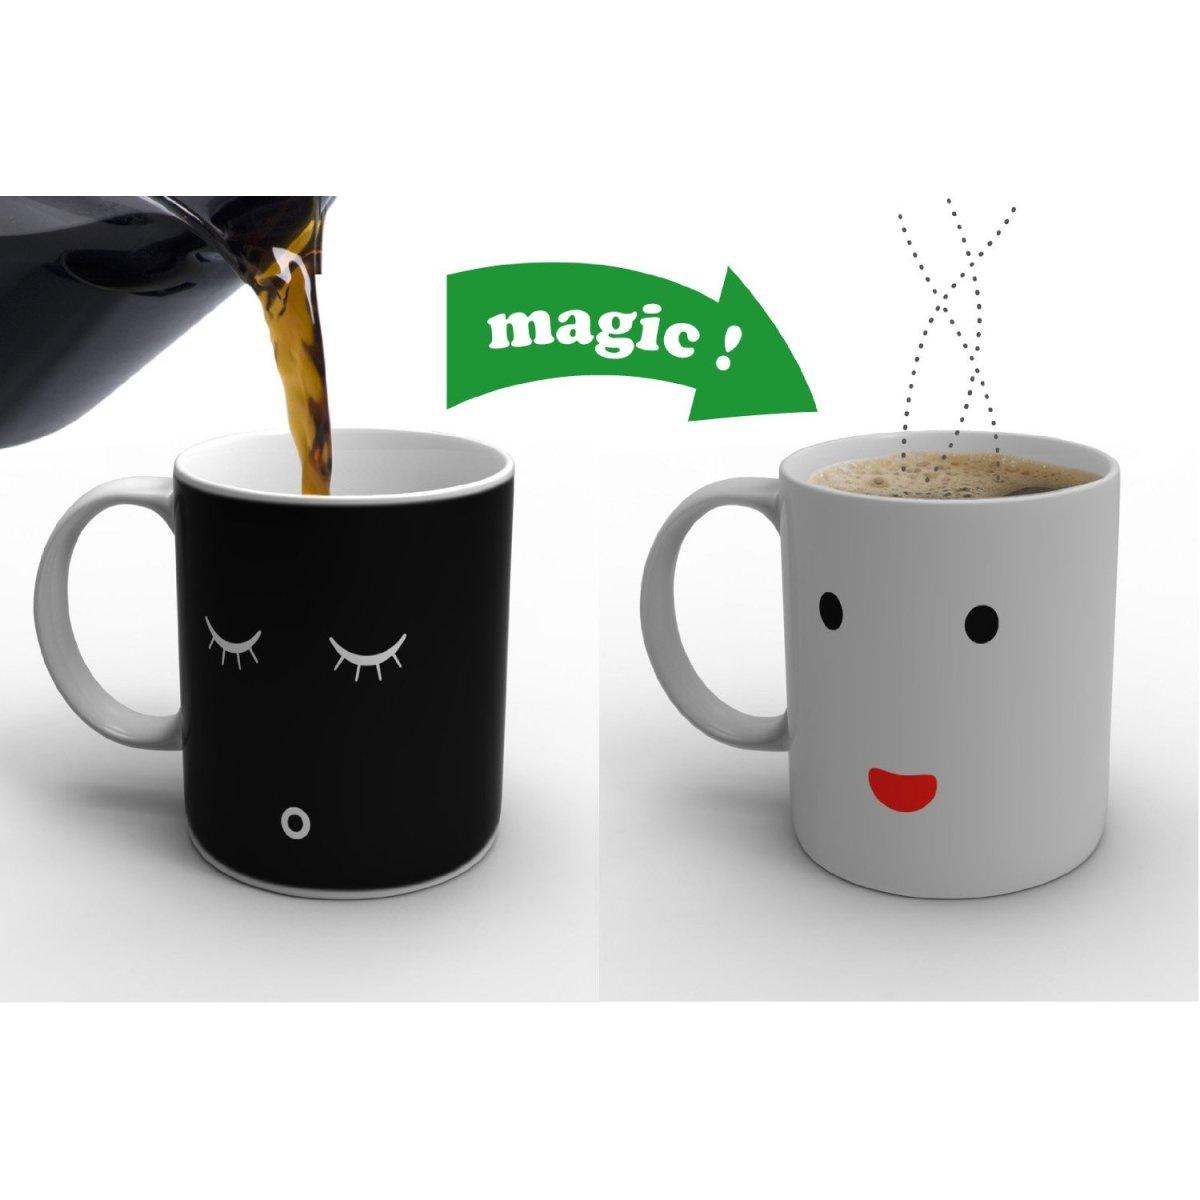 Magic Morning Mug - Coffee, Mugs, Coffee Mugs, History and Fun facts, by Rosie2010